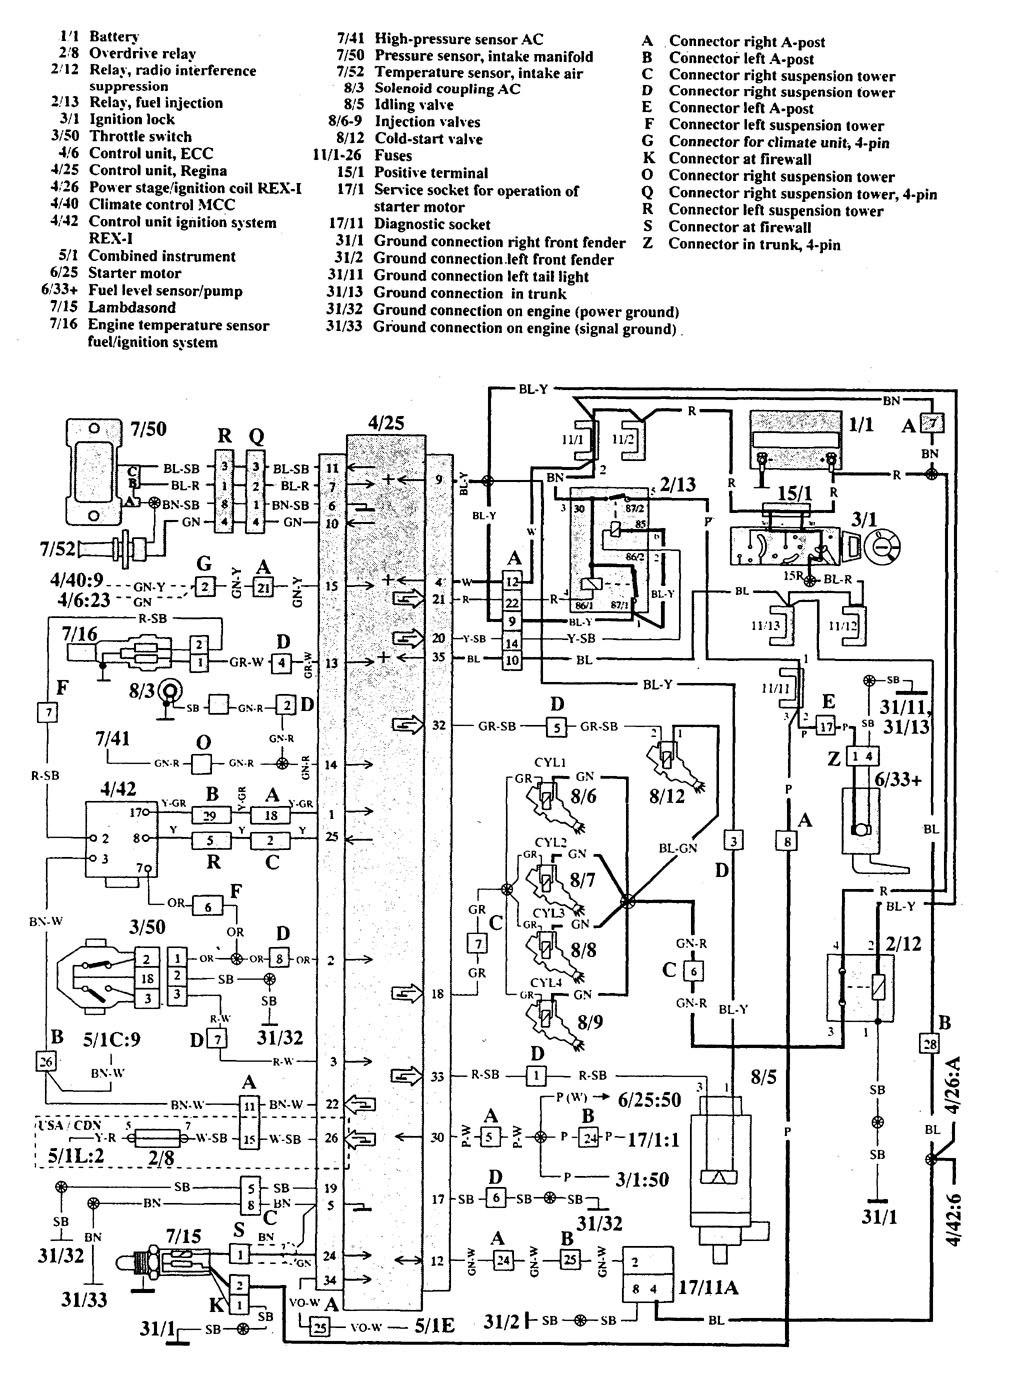 1992 Volvo 940 Radio Wiring - wiring diagram bike-save -  bike-save.vaiatempo.it | Volvo 940 Wiring Diagram Radio |  | vaiatempo.it